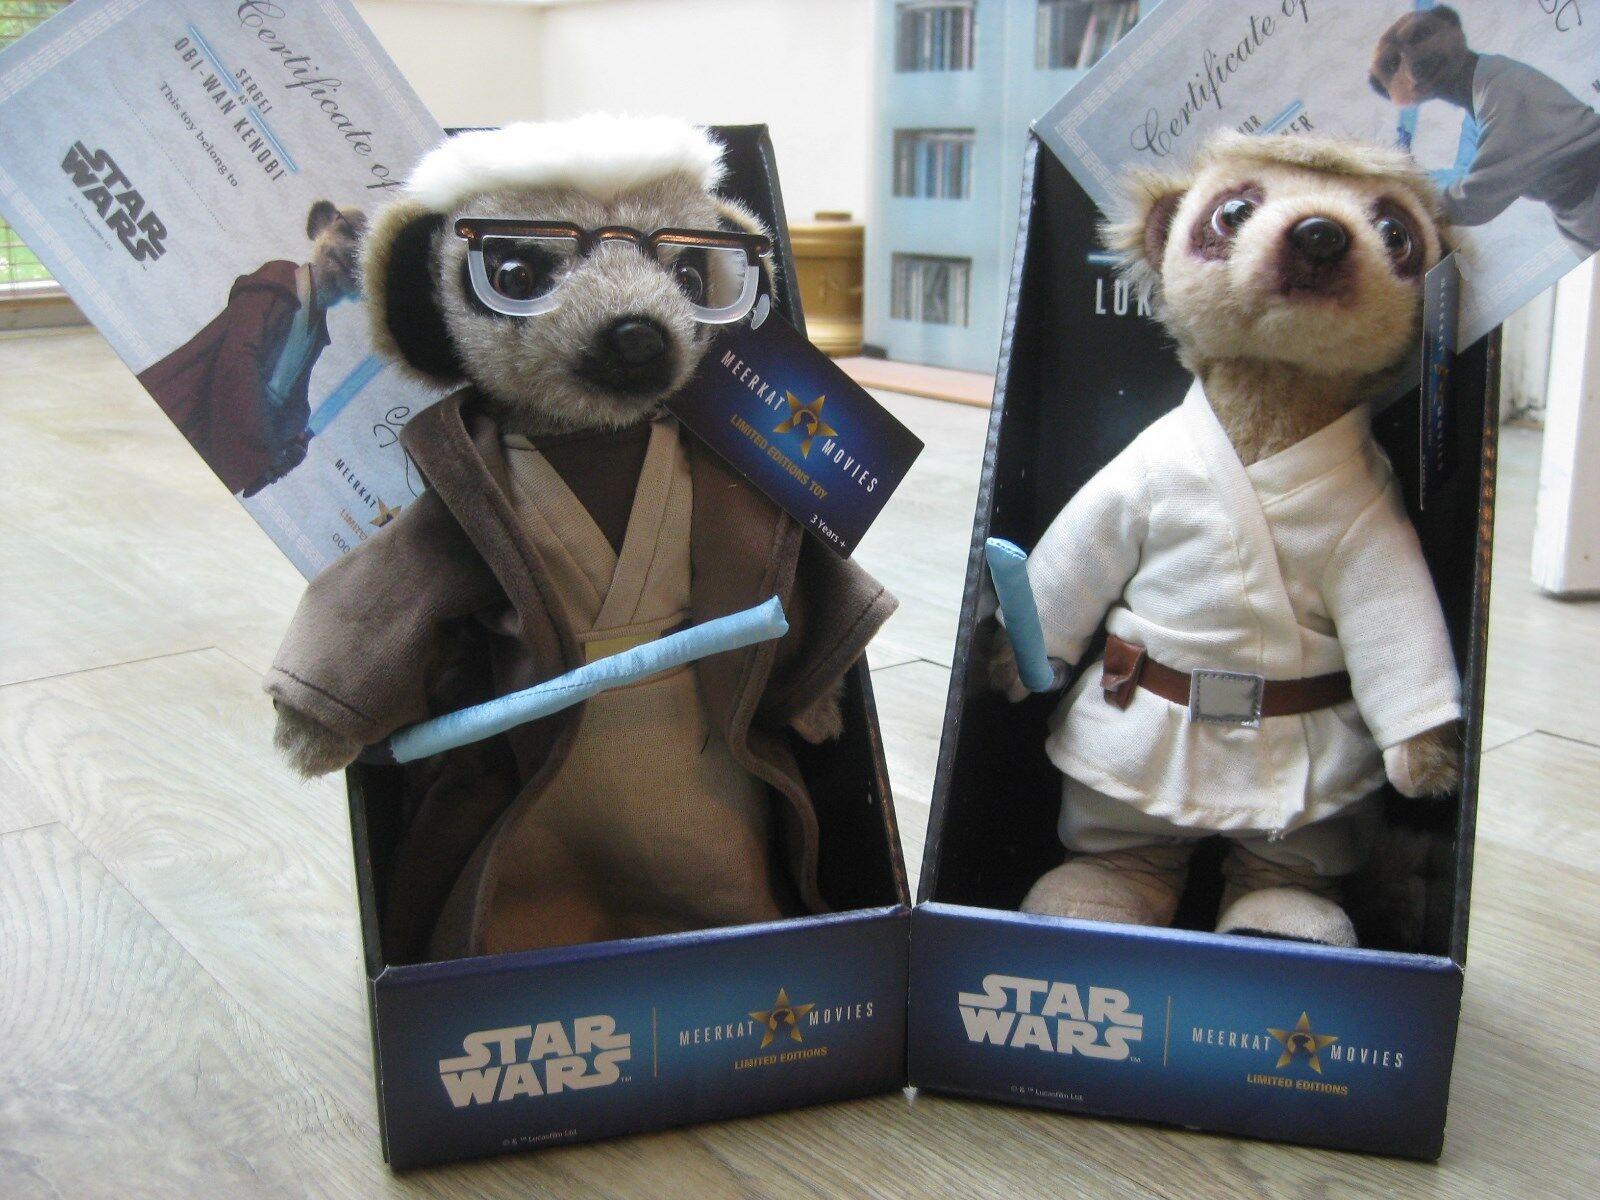 STAR STAR STAR WARS Sergei as Obi-Wan Kenobi & Aleksandr as Luke Skywalker Meerkat  BNIB 8fe9e0